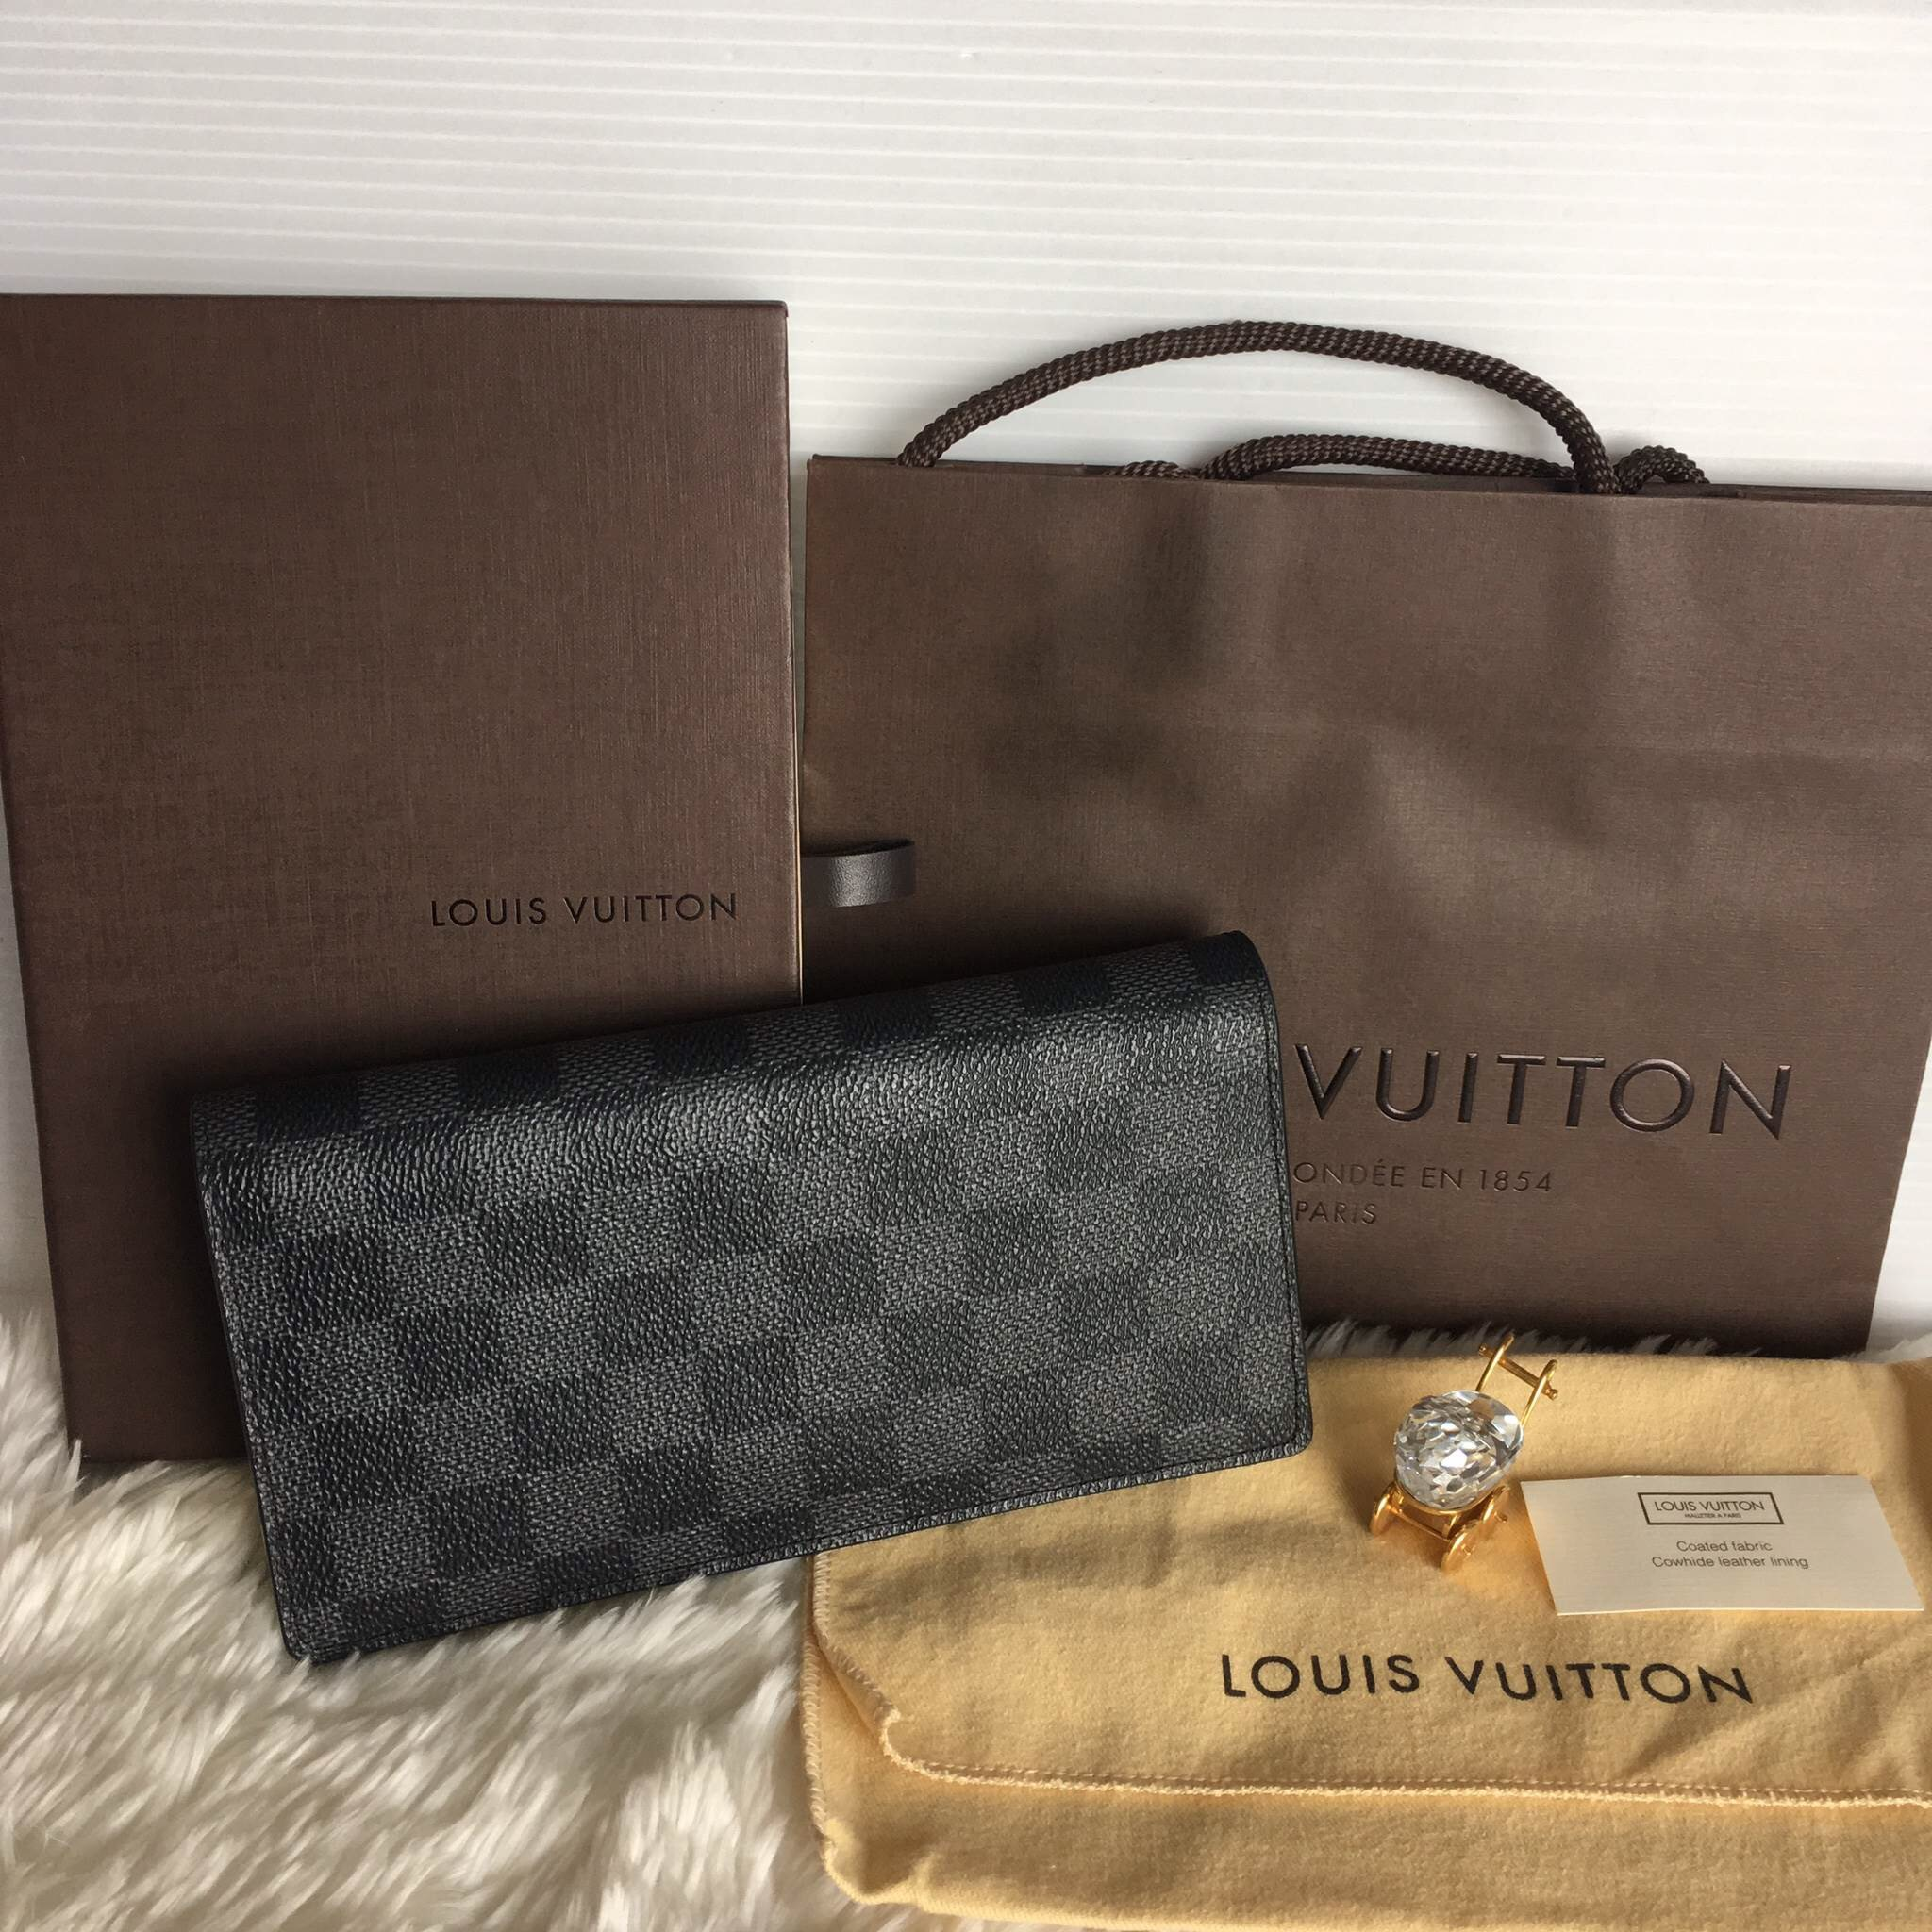 LOUISVUITTON brazza wallet graphite